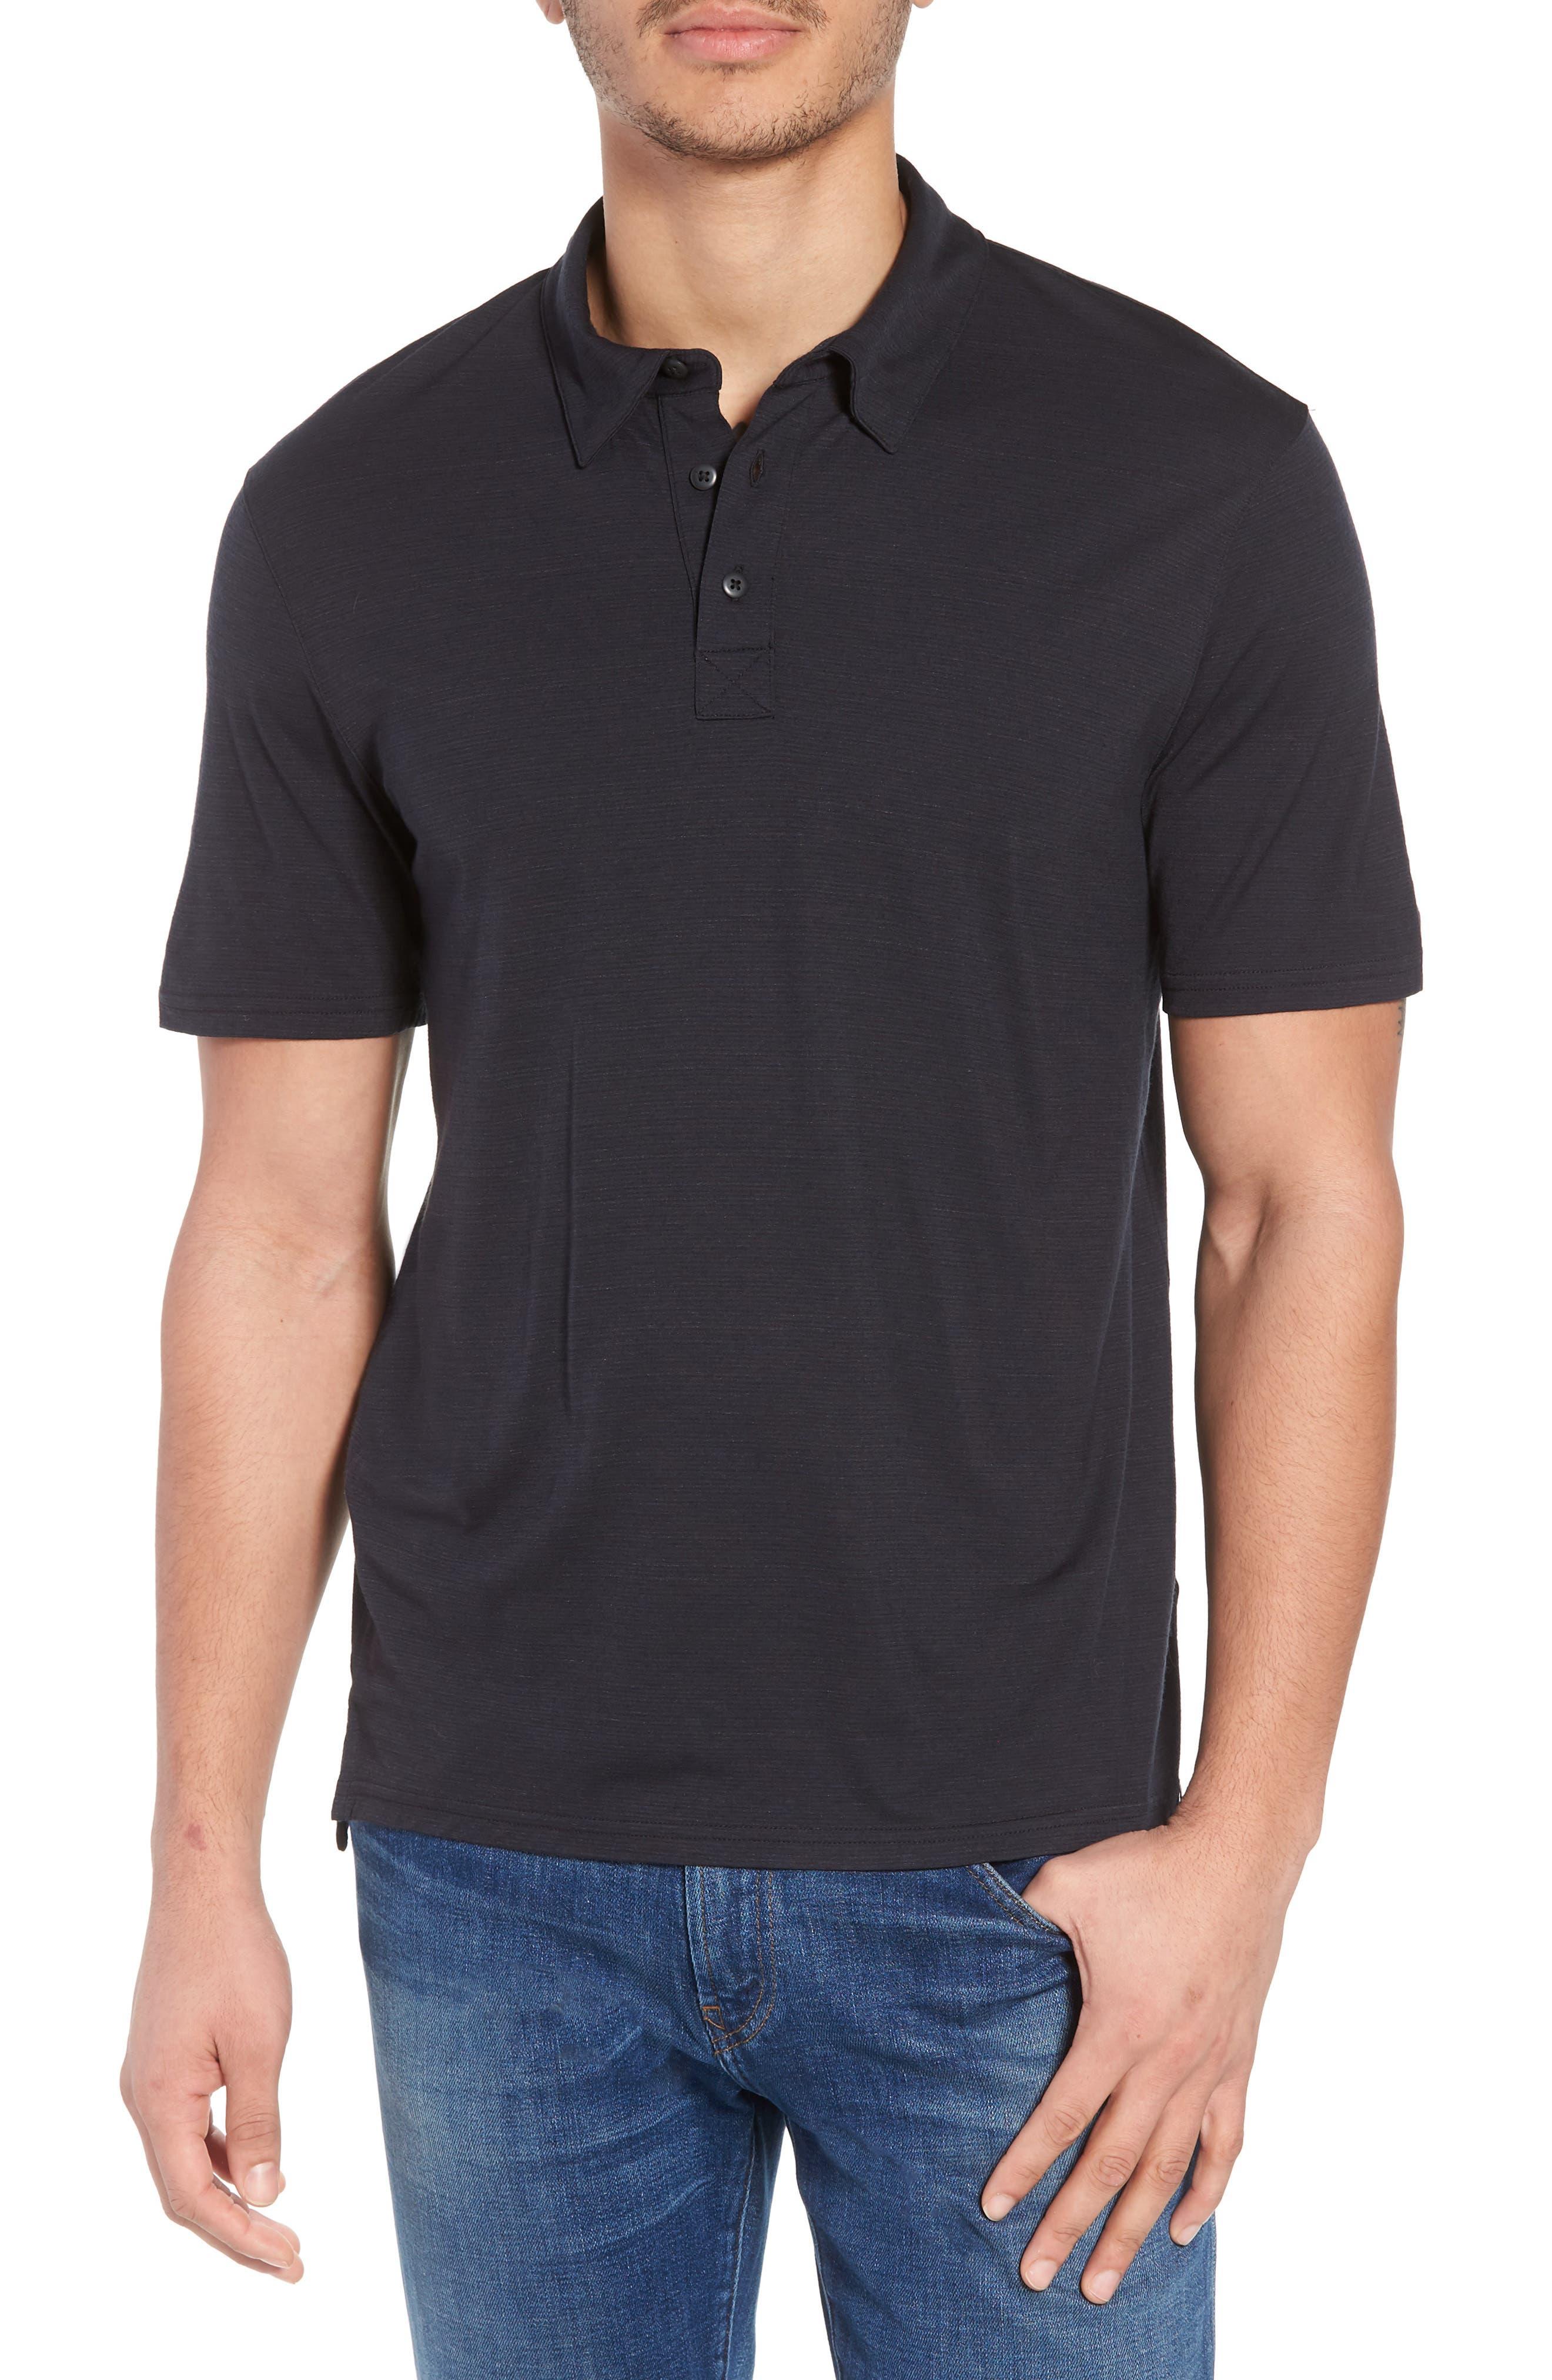 Merino 150 Wool Blend Polo Shirt,                             Main thumbnail 1, color,                             Charcoal